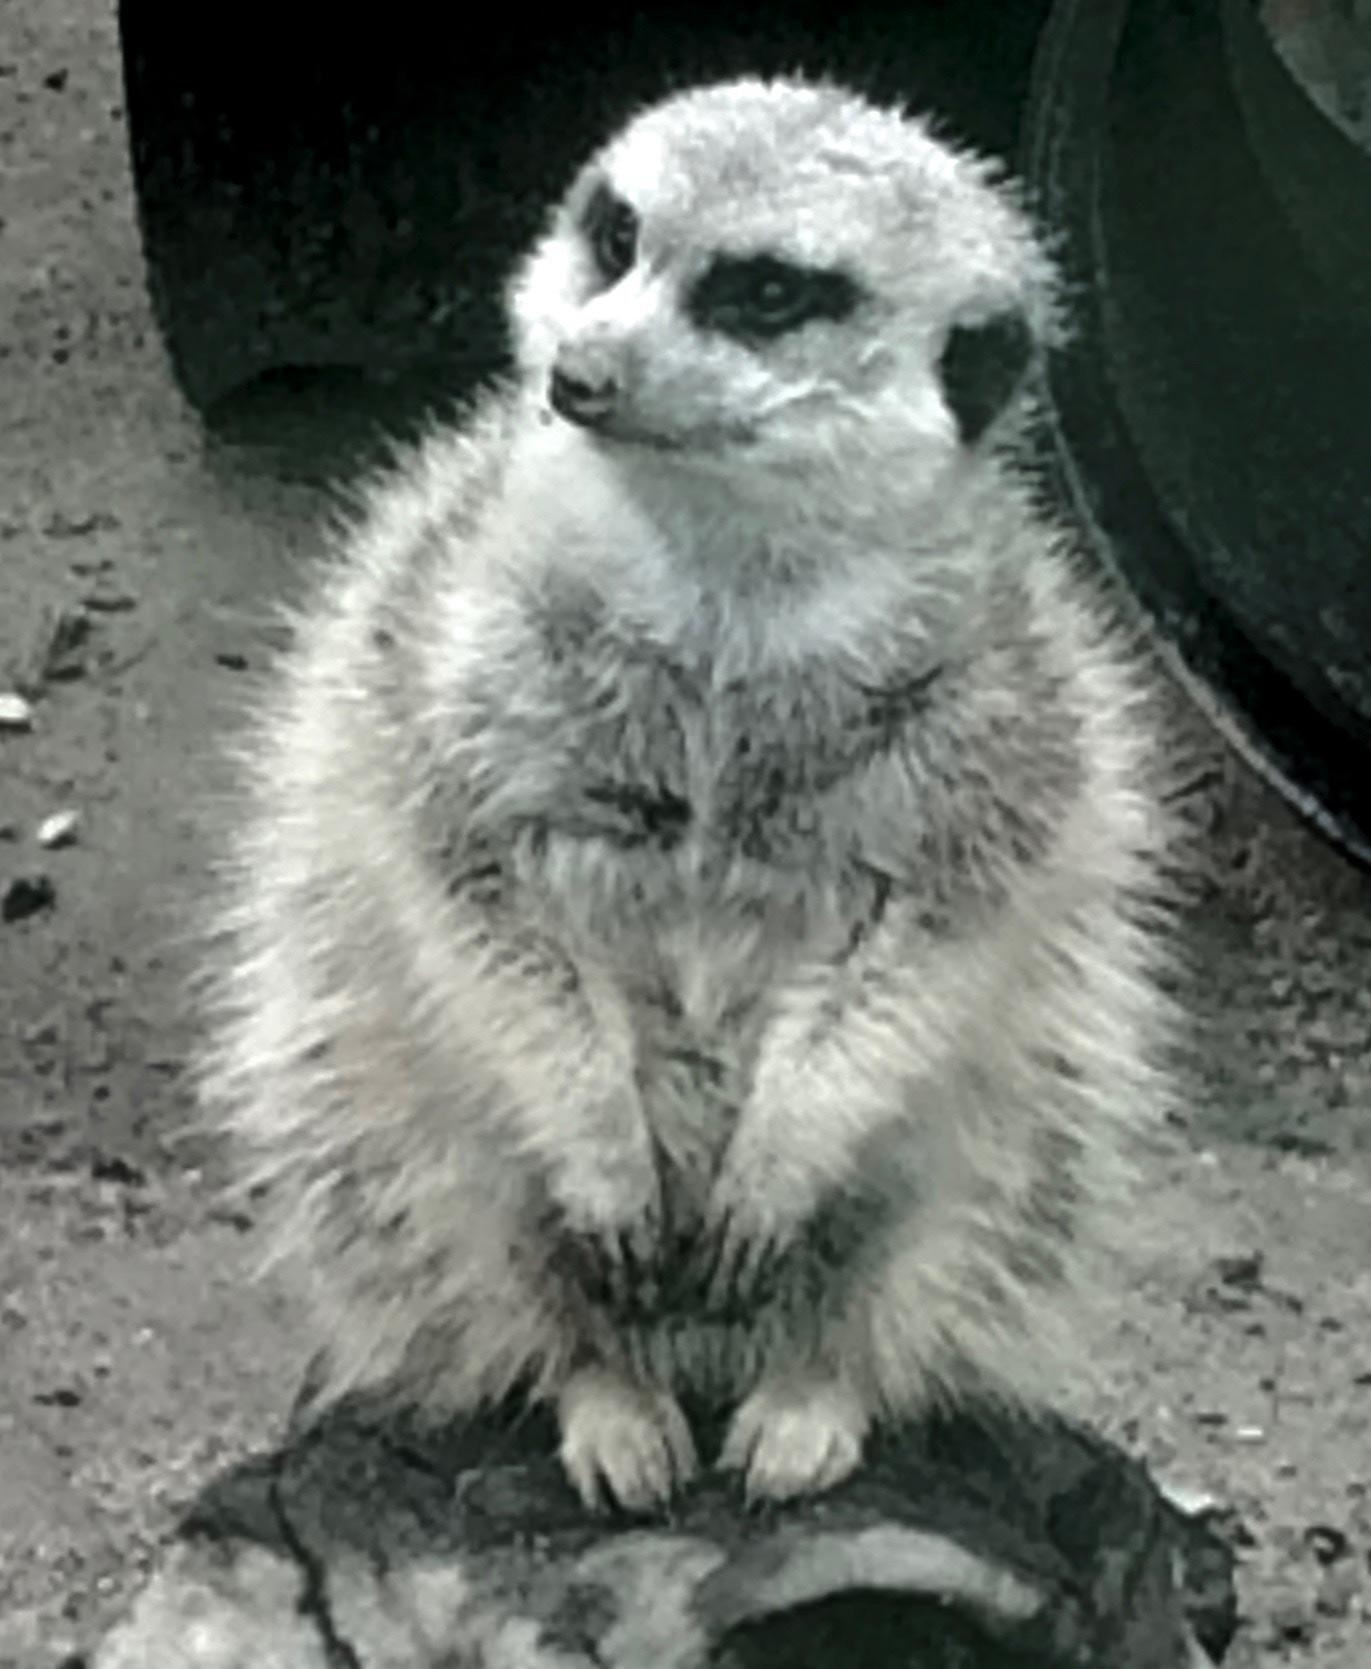 black-and-white-photo-of-wise-old-meerkat-by-kathryn-beam-troxler-IMG_1649.jpg